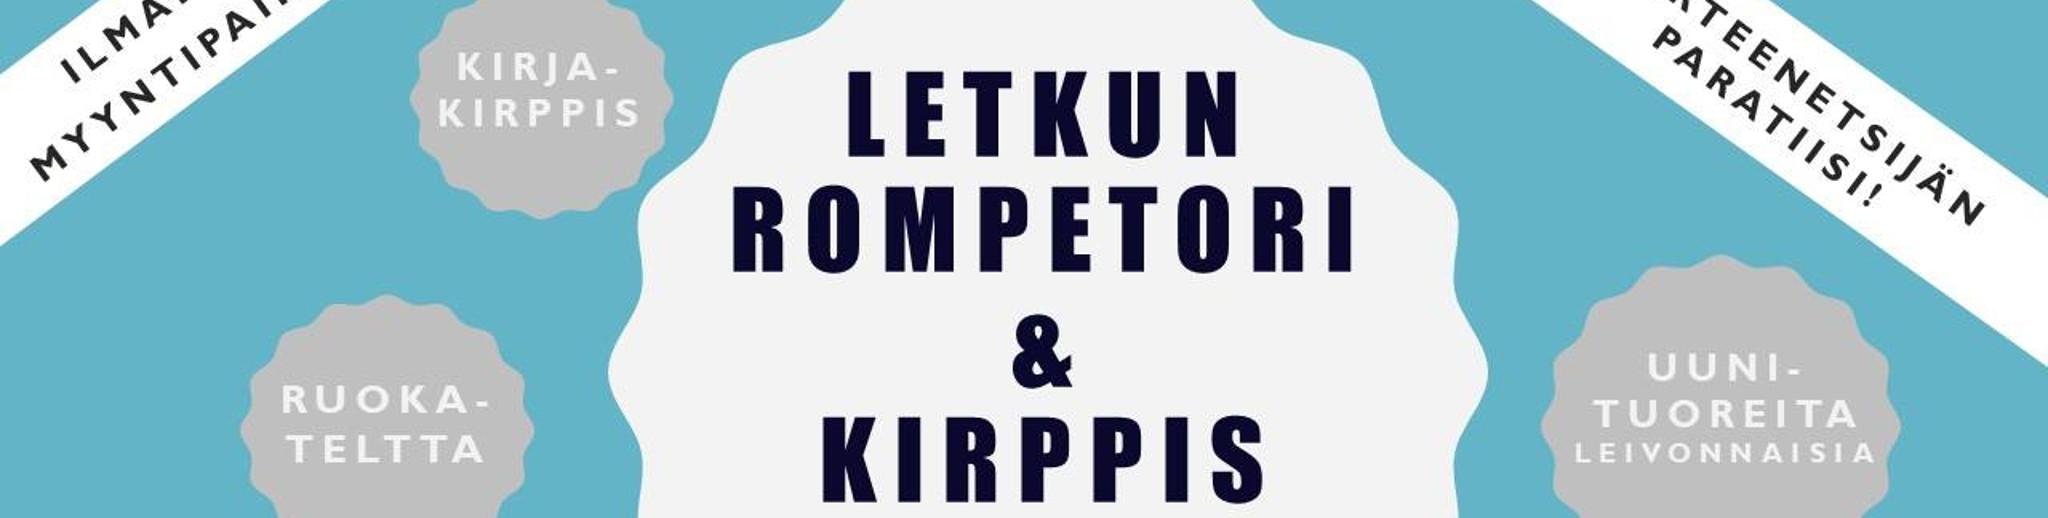 Letkun rompetori & kirppis 18.8.2018